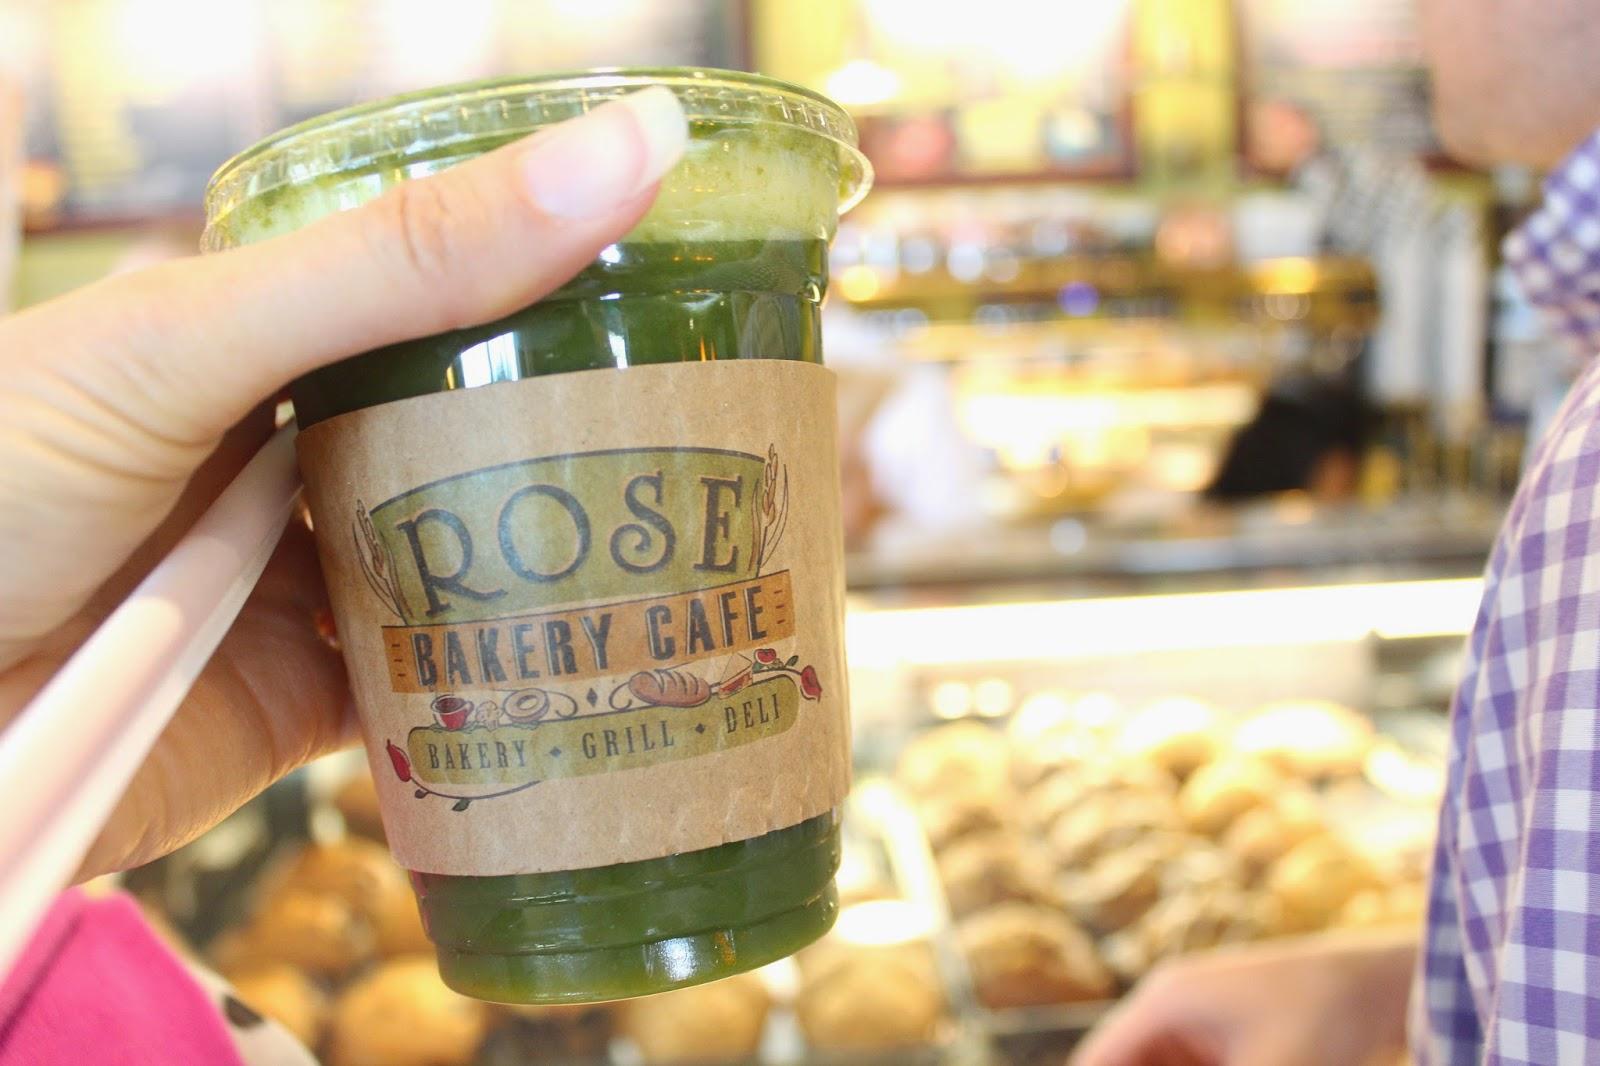 Rose Bakery Cafe Newport Beach